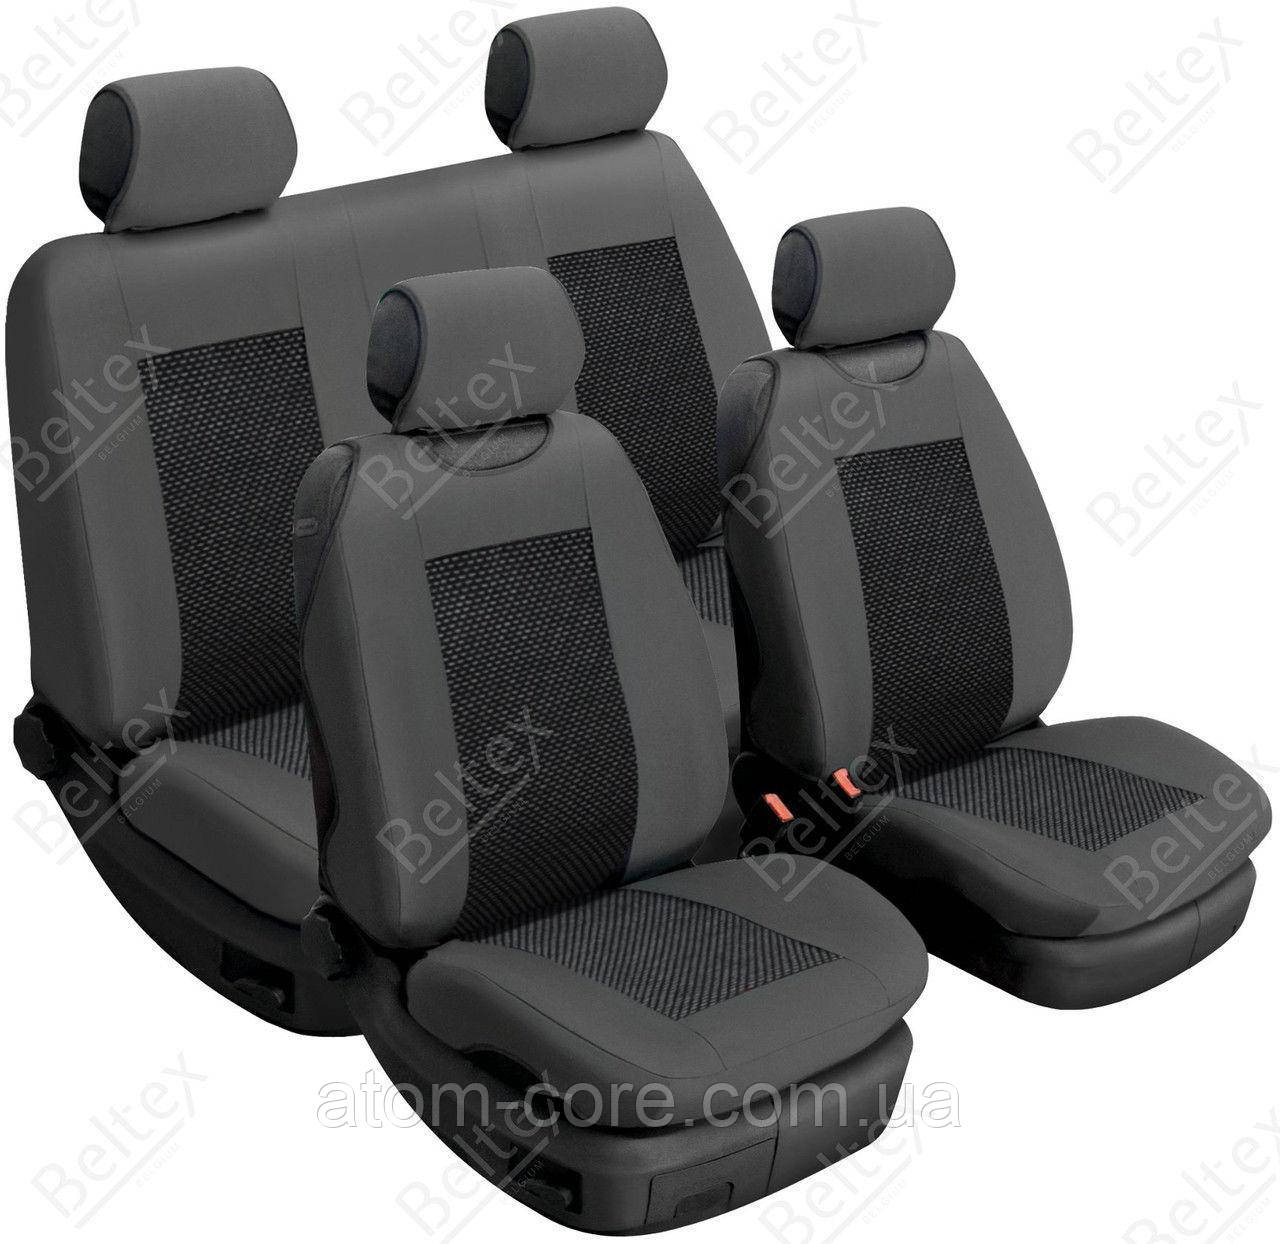 Майки/чехлы на сиденья Сеат Кордоба 1 (Seat Cordoba I)